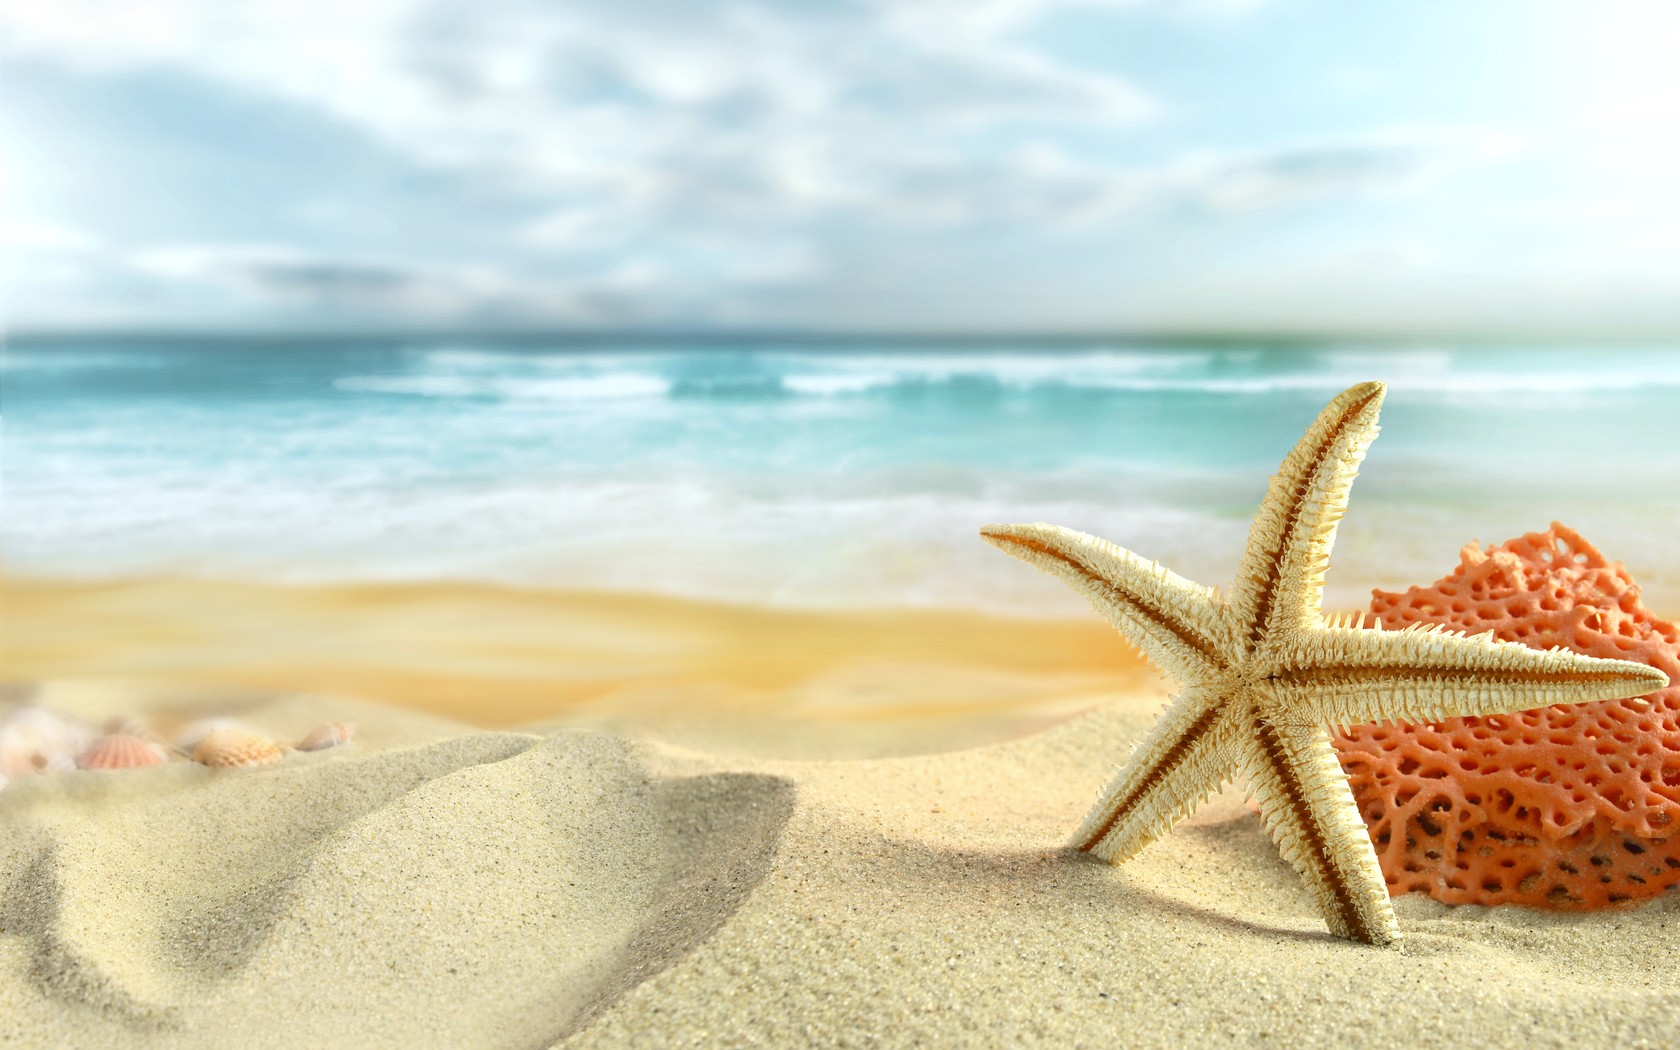 Ocean sand stars starfish sea beaches wallpaper 1680x1050 184243 1680x1050